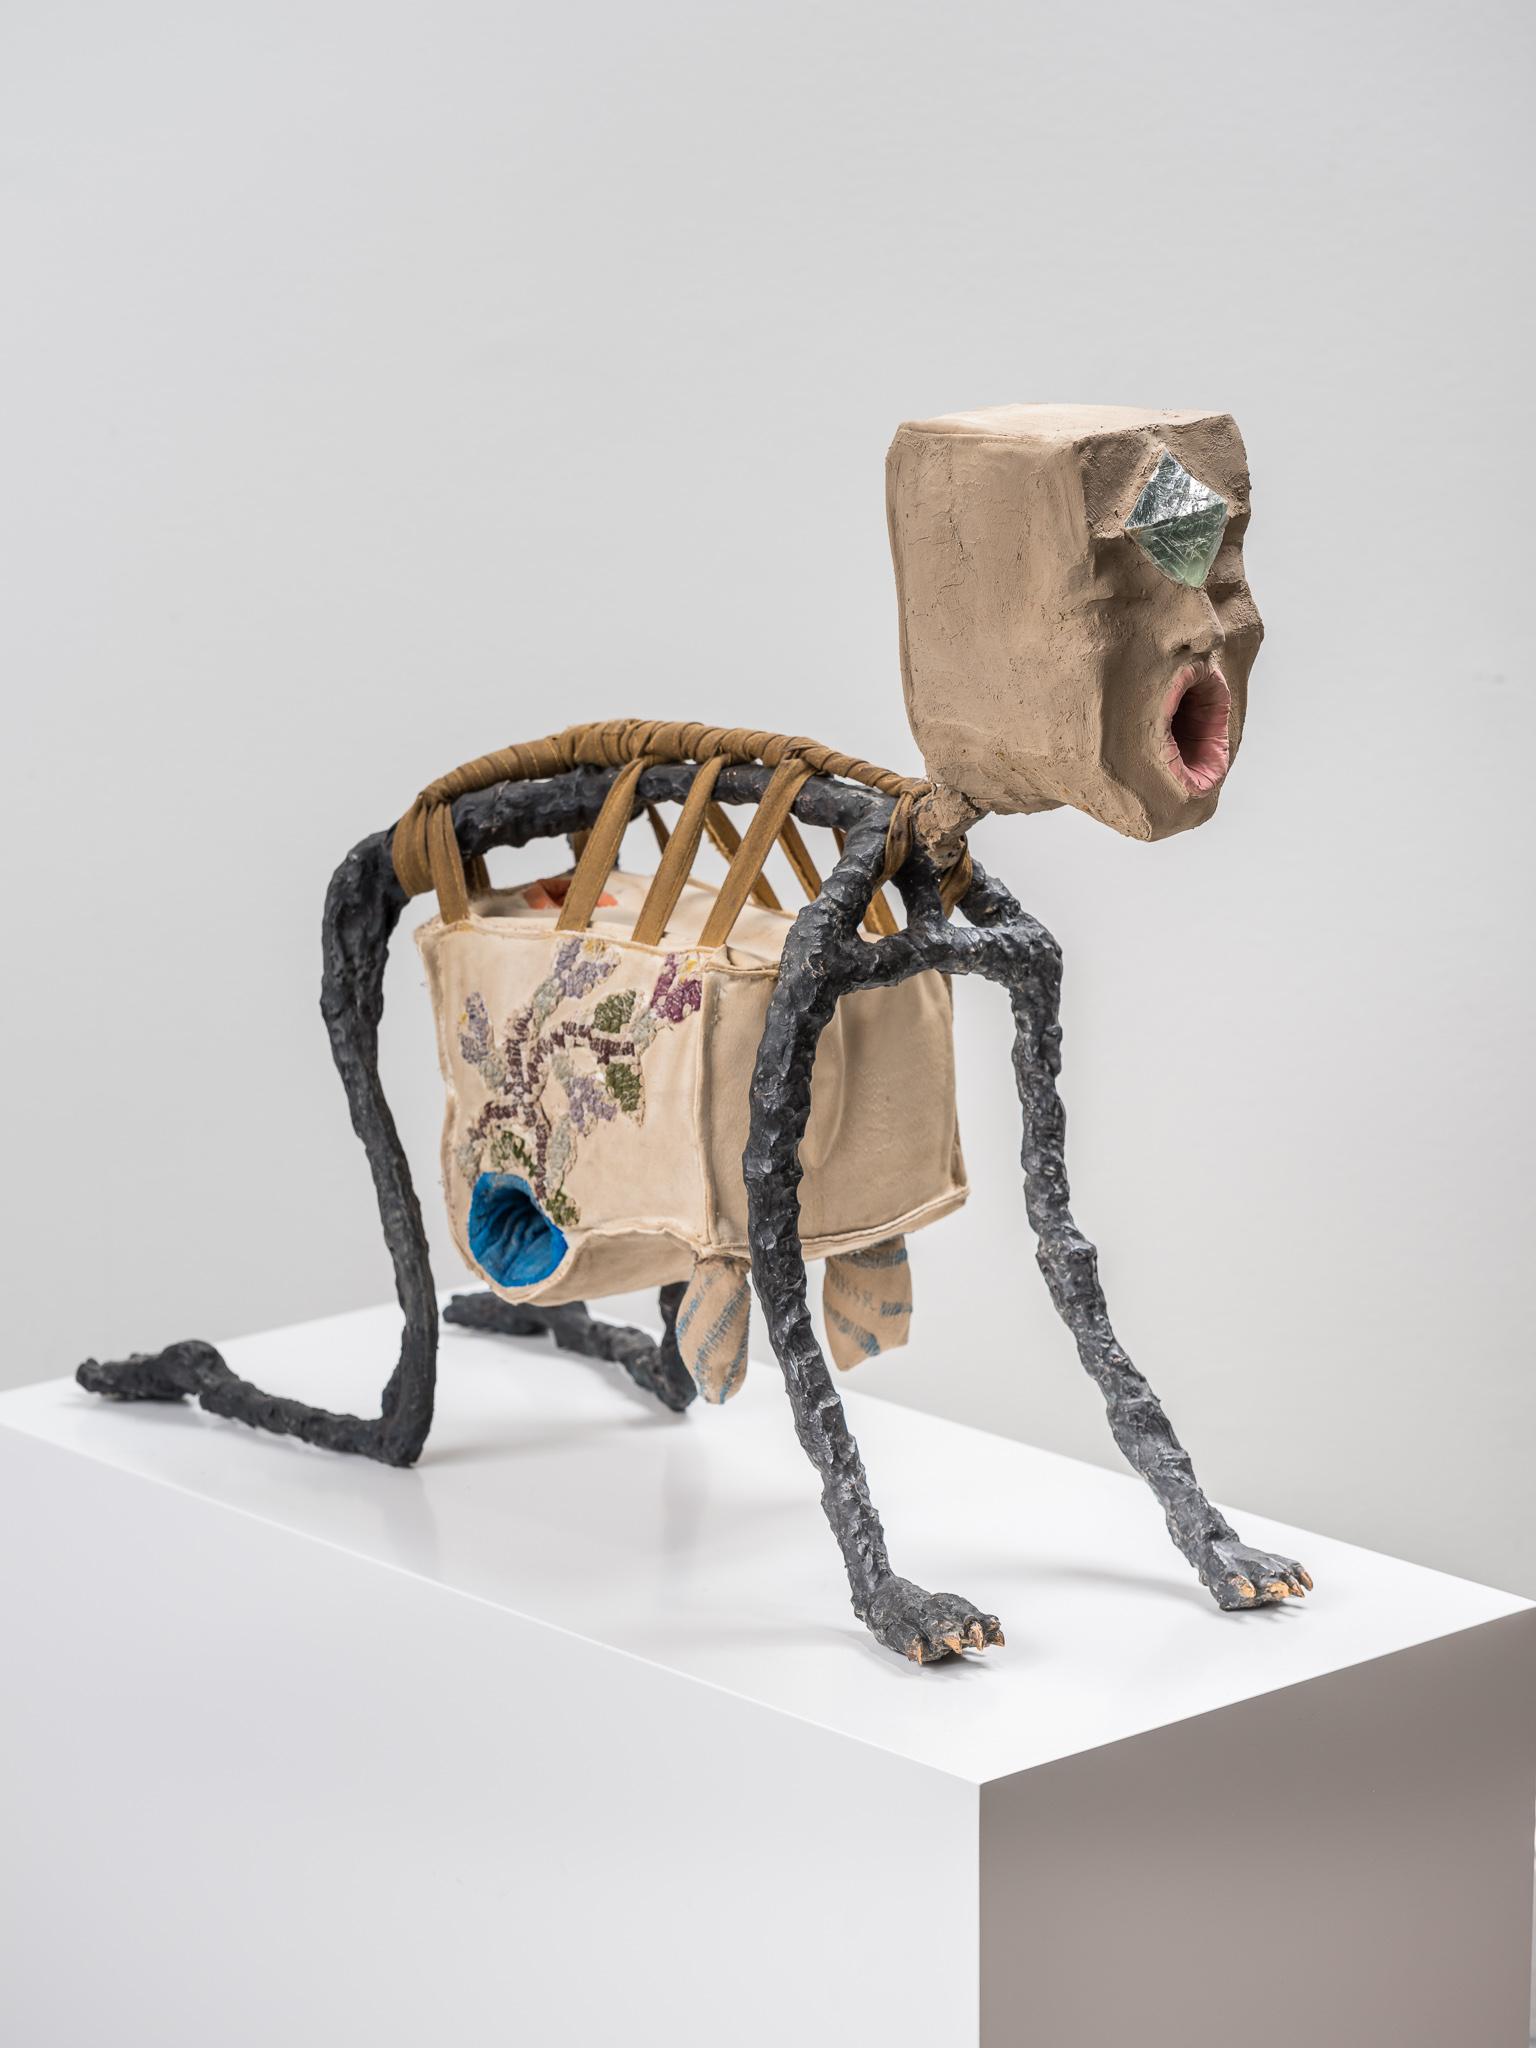 On All Four #2, 2018, Patinated bronze, clay, textile, unpolished Smoky Quartz, coral, 48,5 x 60,5 x 21 cm, Edition of 3 unique sculptures + 1 AP